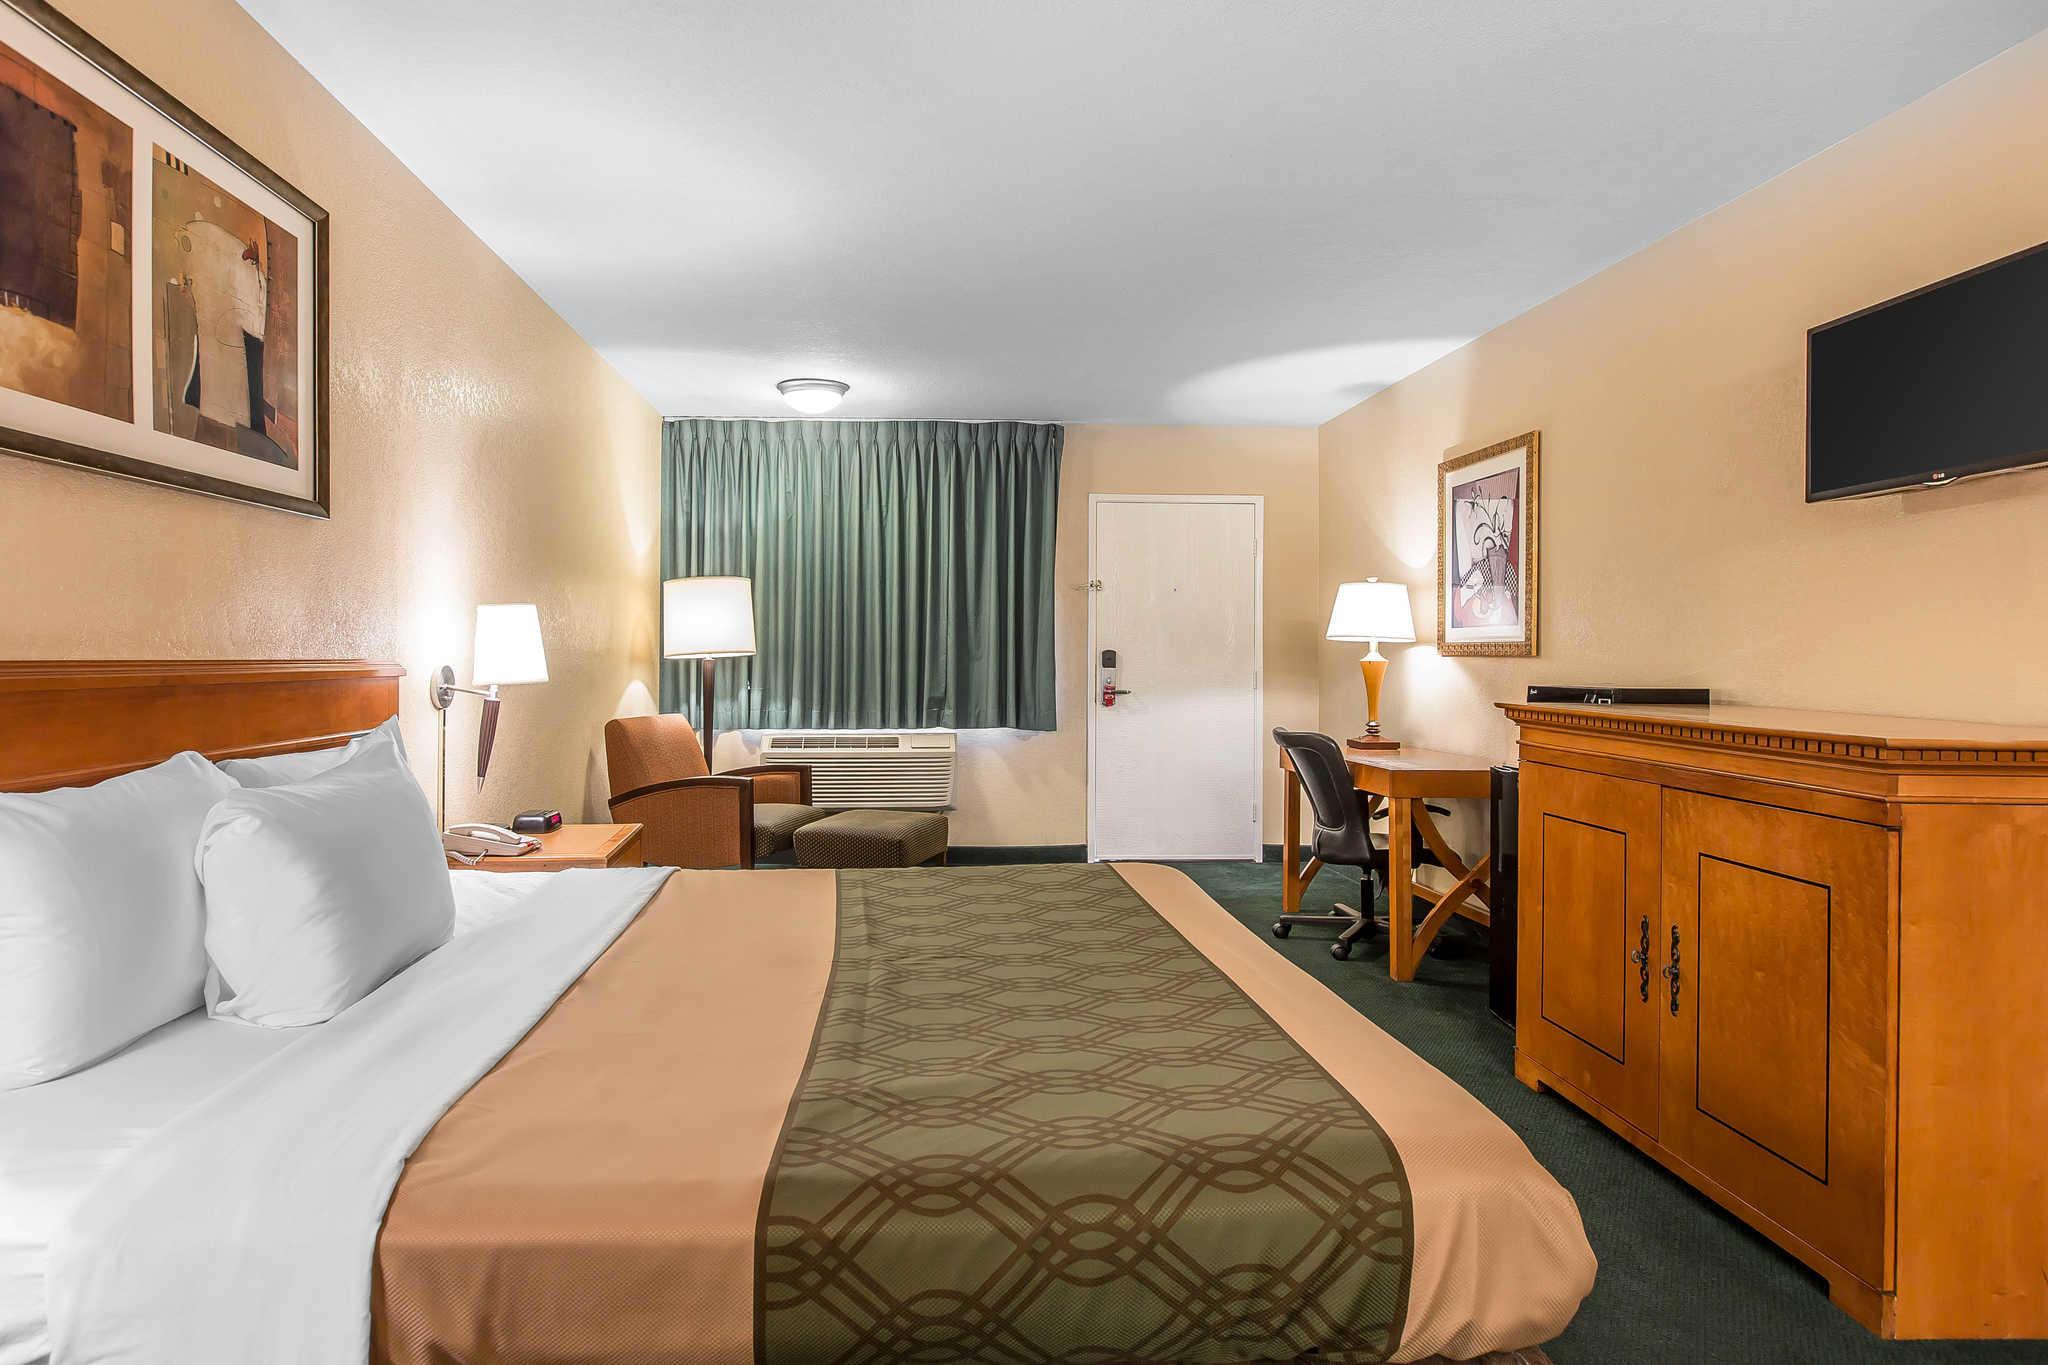 Room For Rent El Cajon San Diego